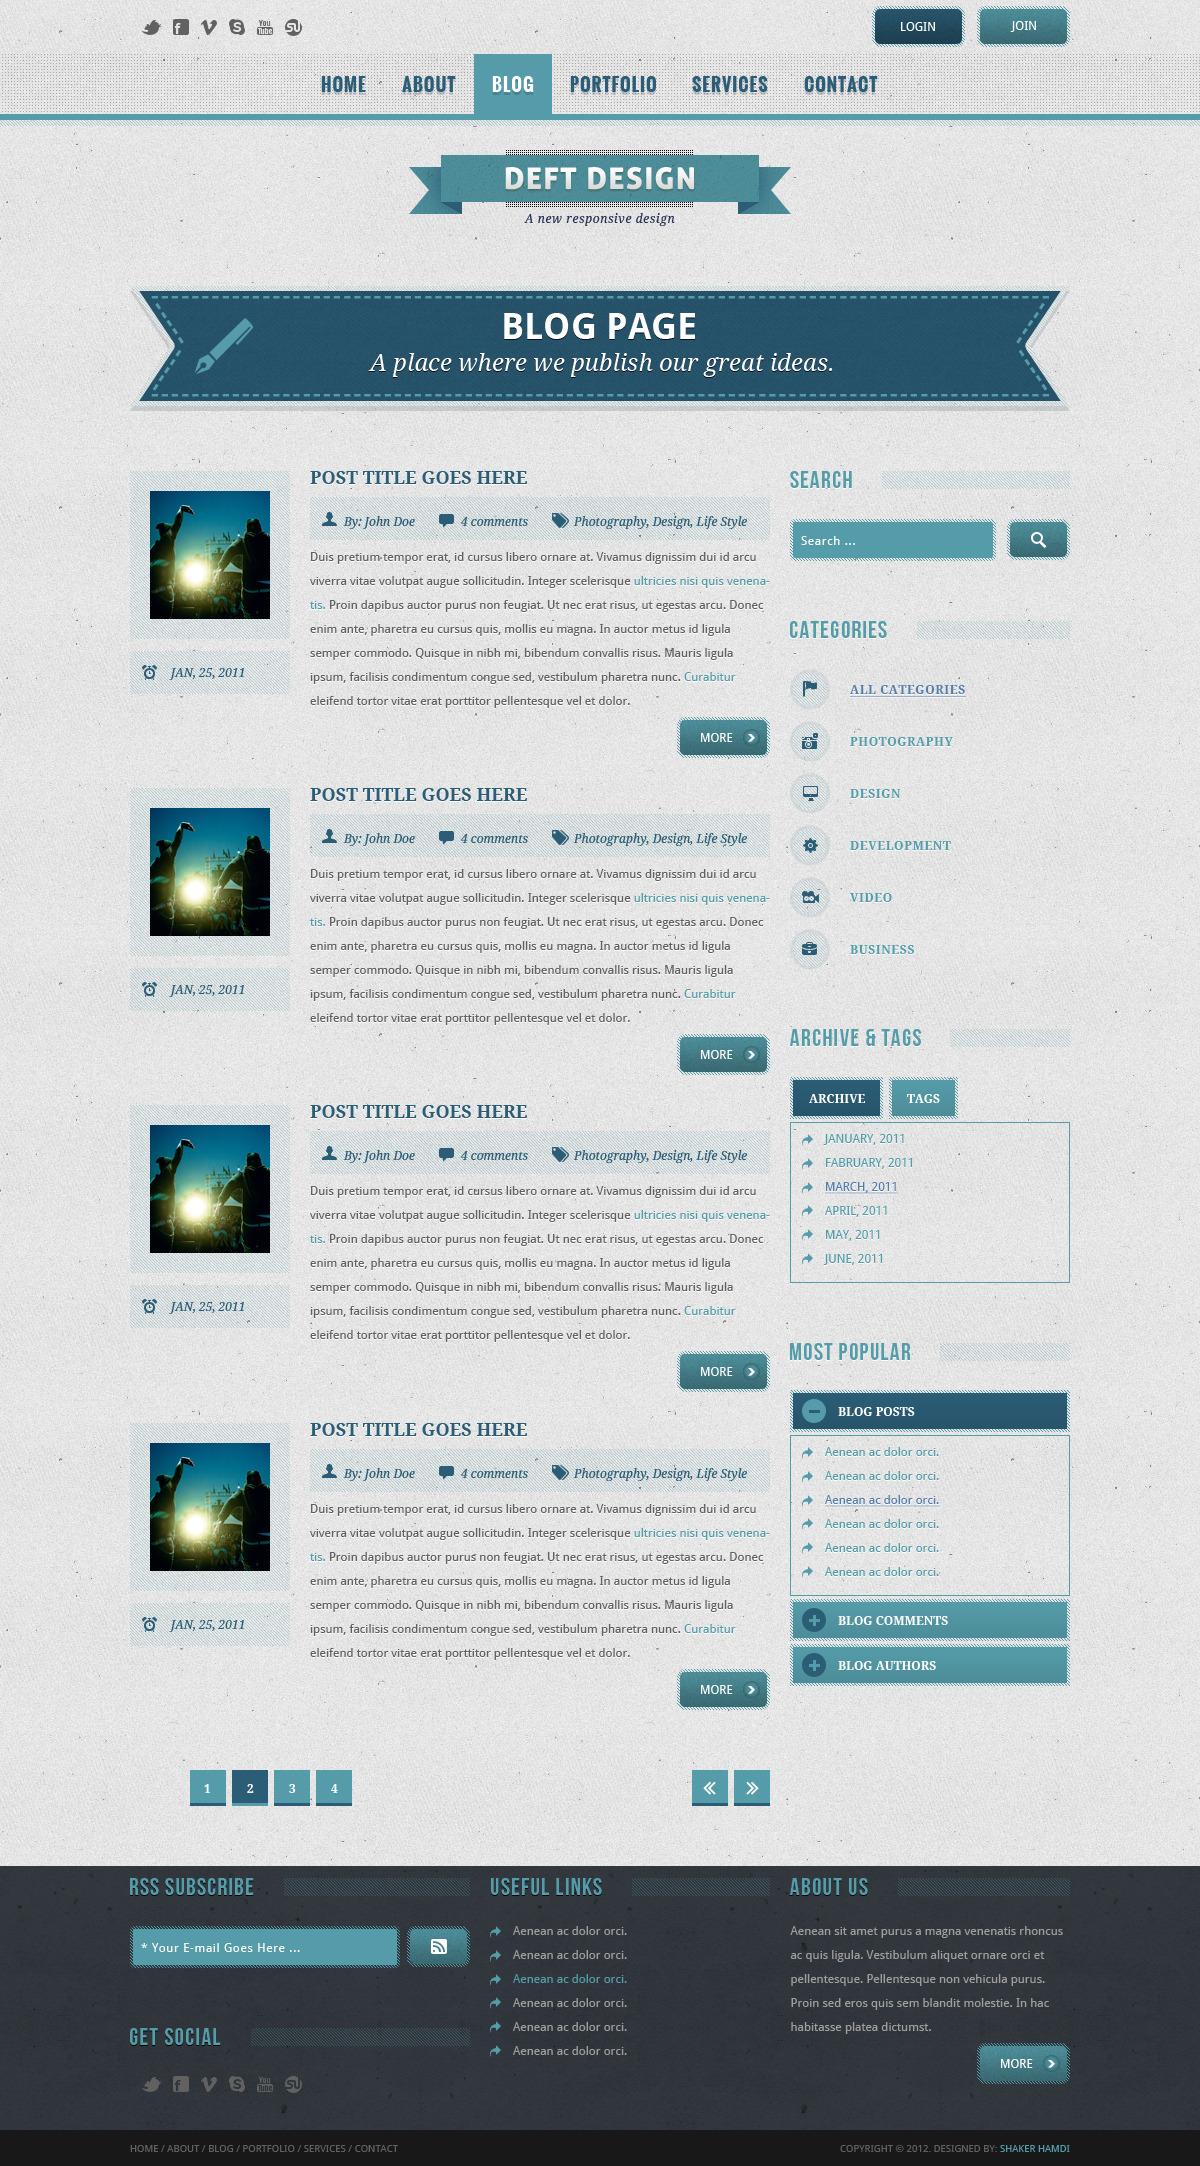 Deft Design - Light And Dark Responsive Template